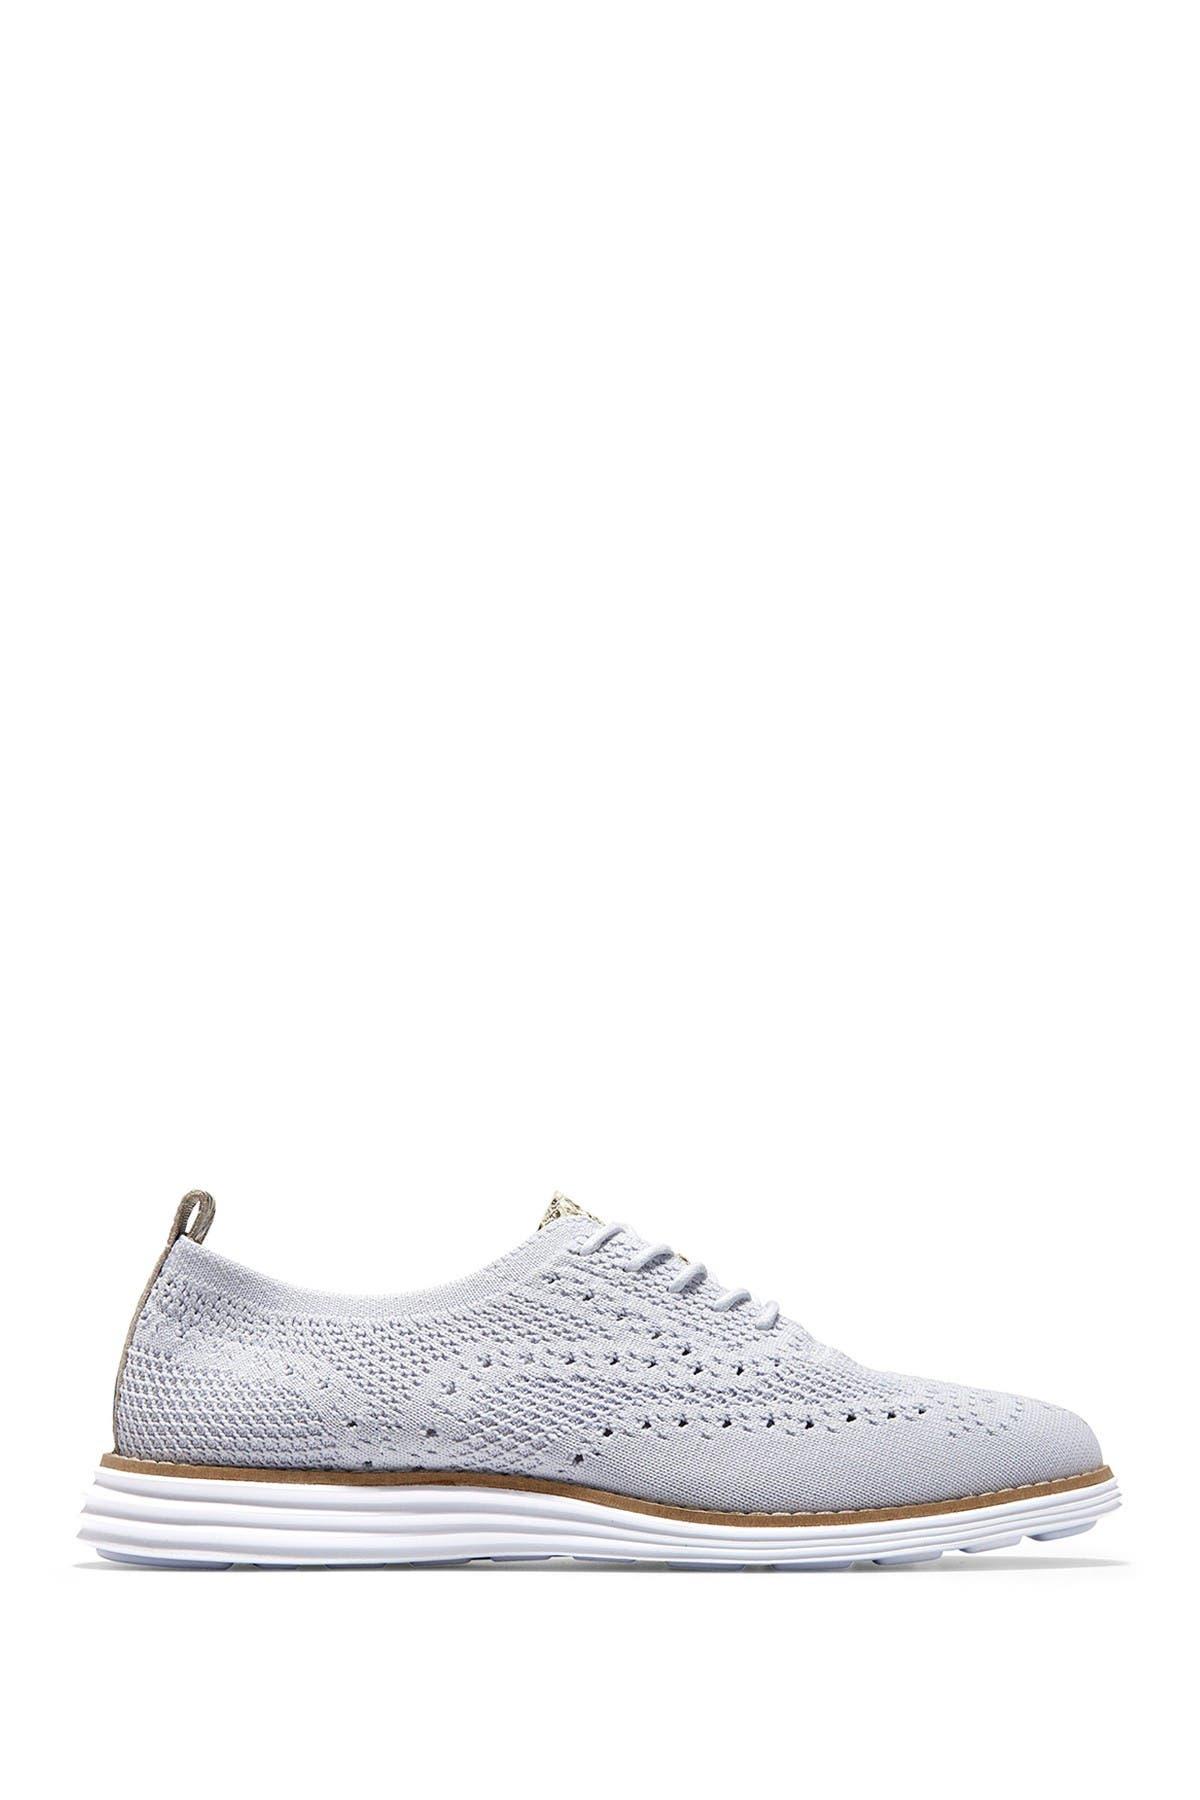 Image of Cole Haan Original Grand Stitchlite Wingtip Oxford Sneaker